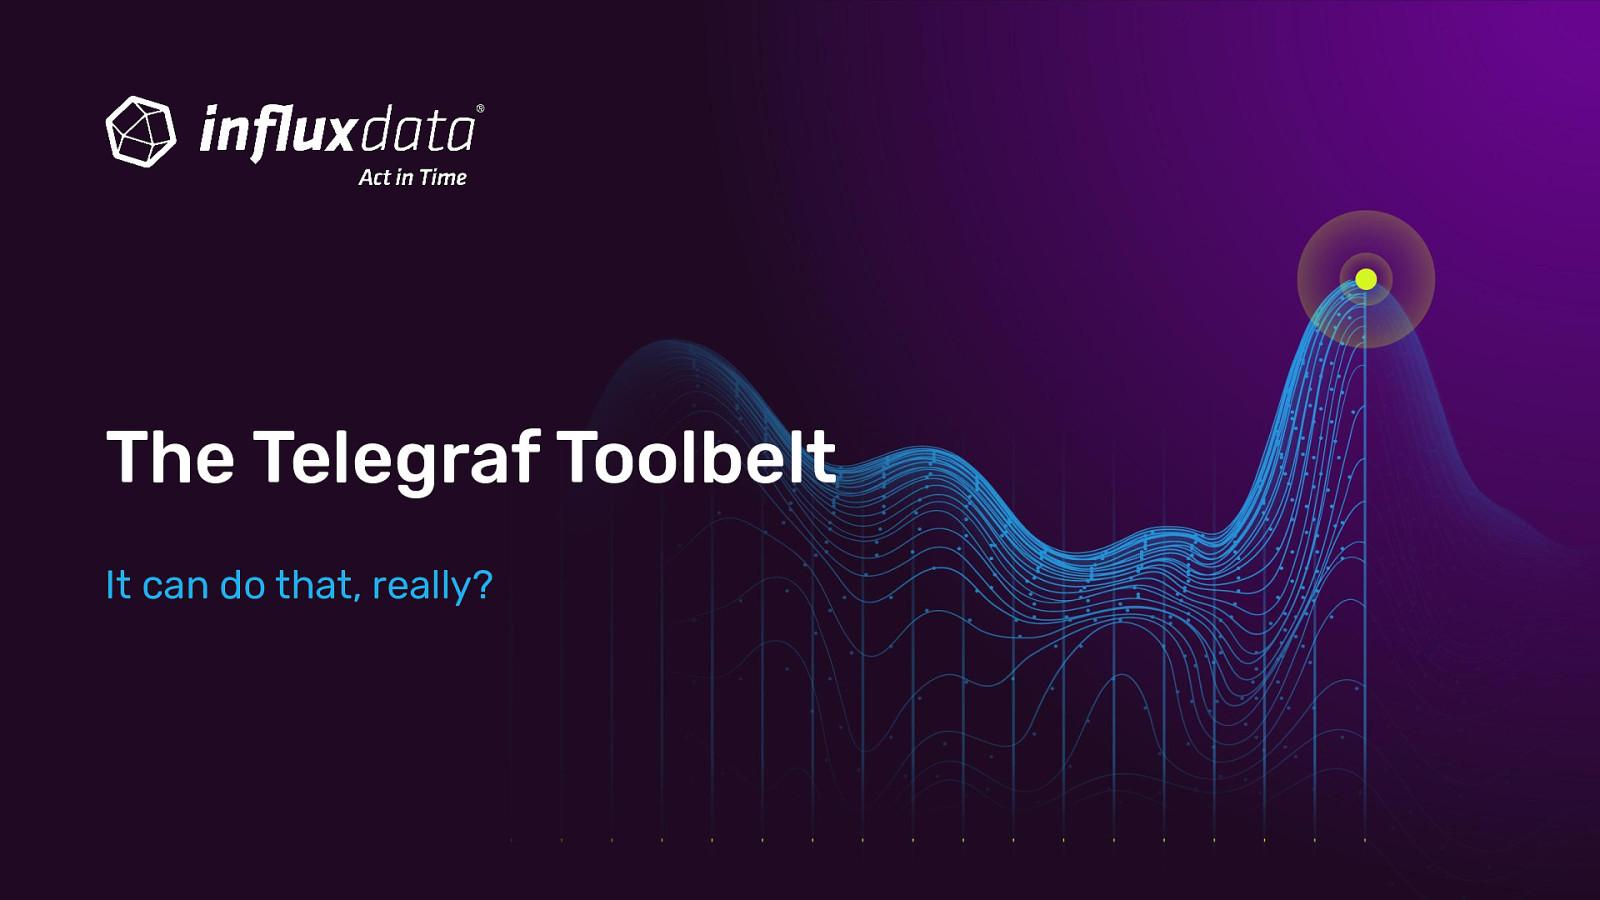 The Telegraf Toolbelt